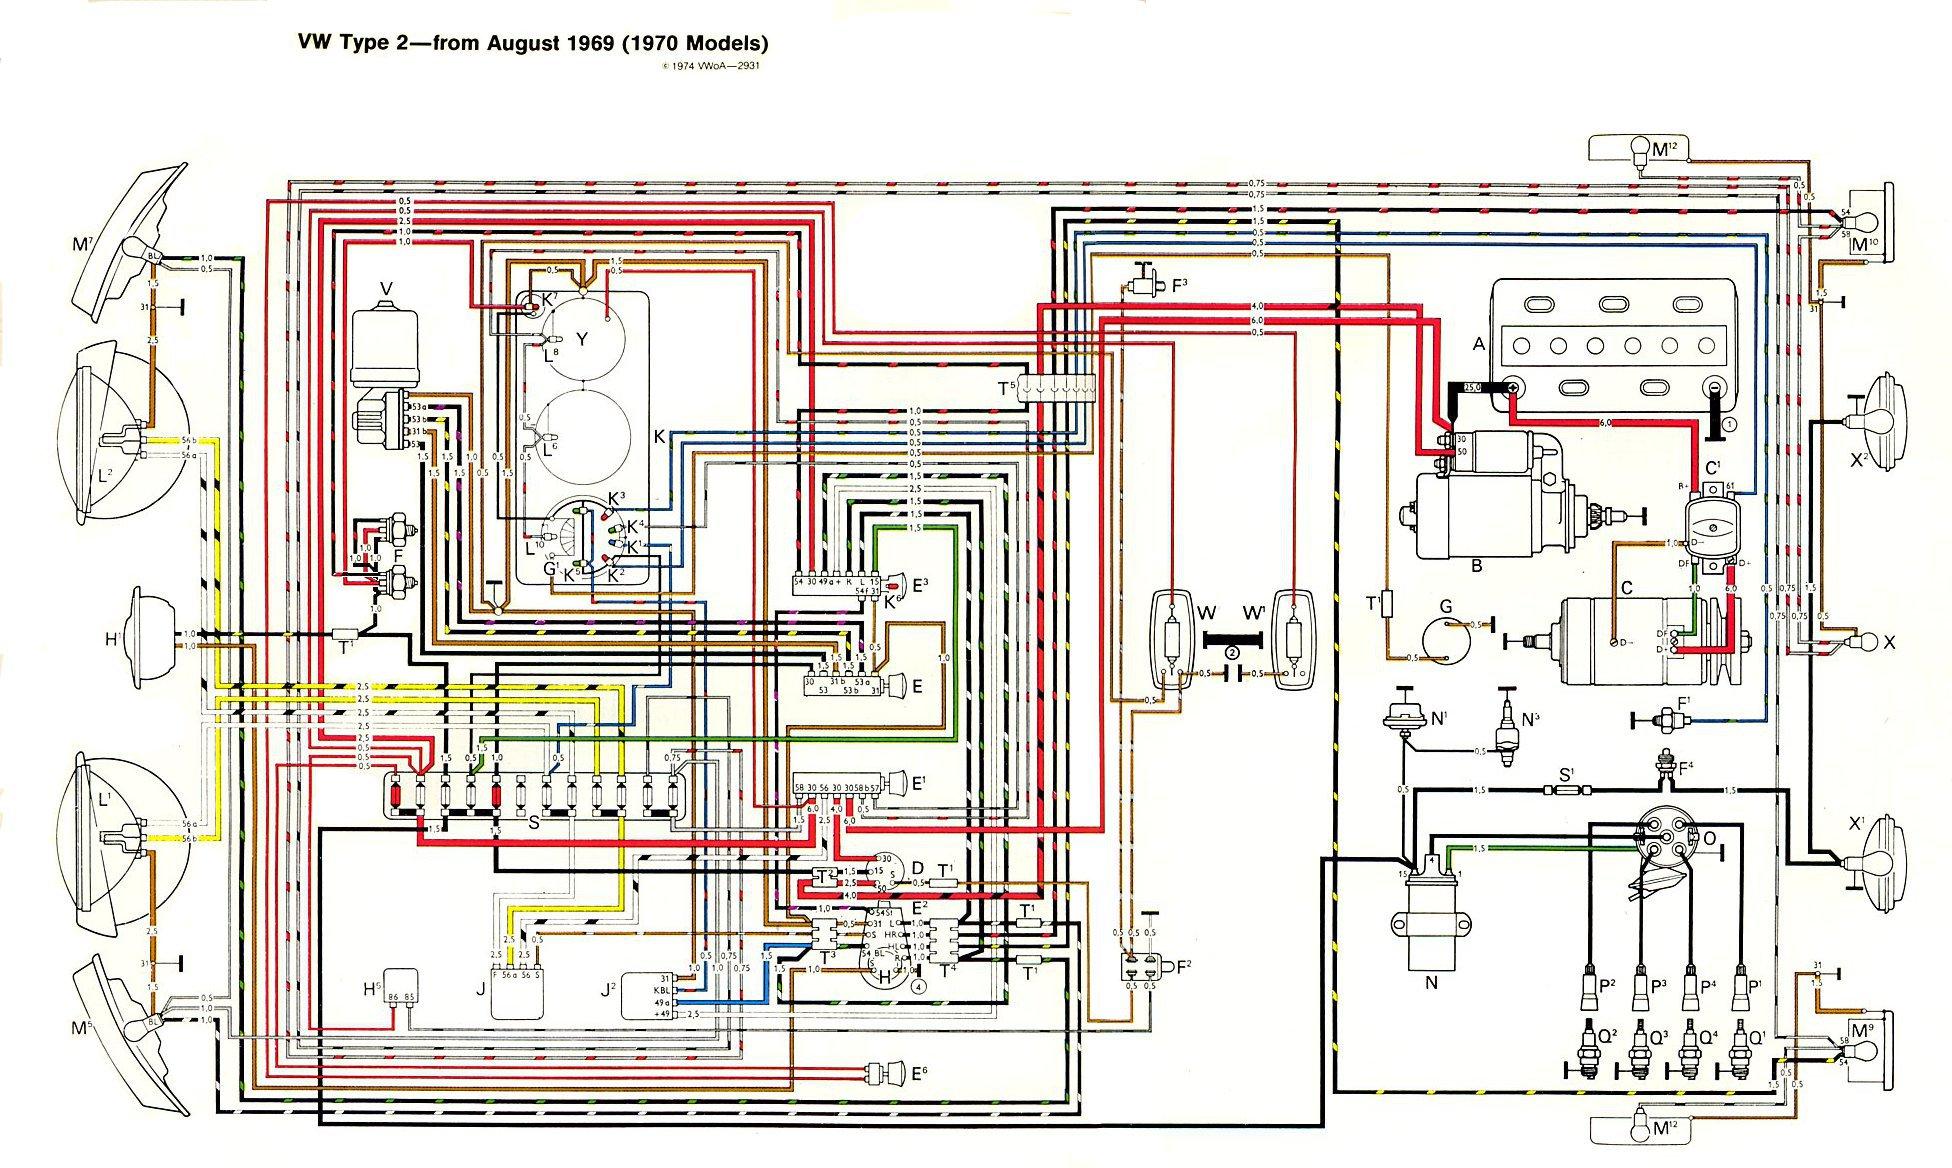 TheSamba.com :: Type 2 Wiring Diagrams The Samba